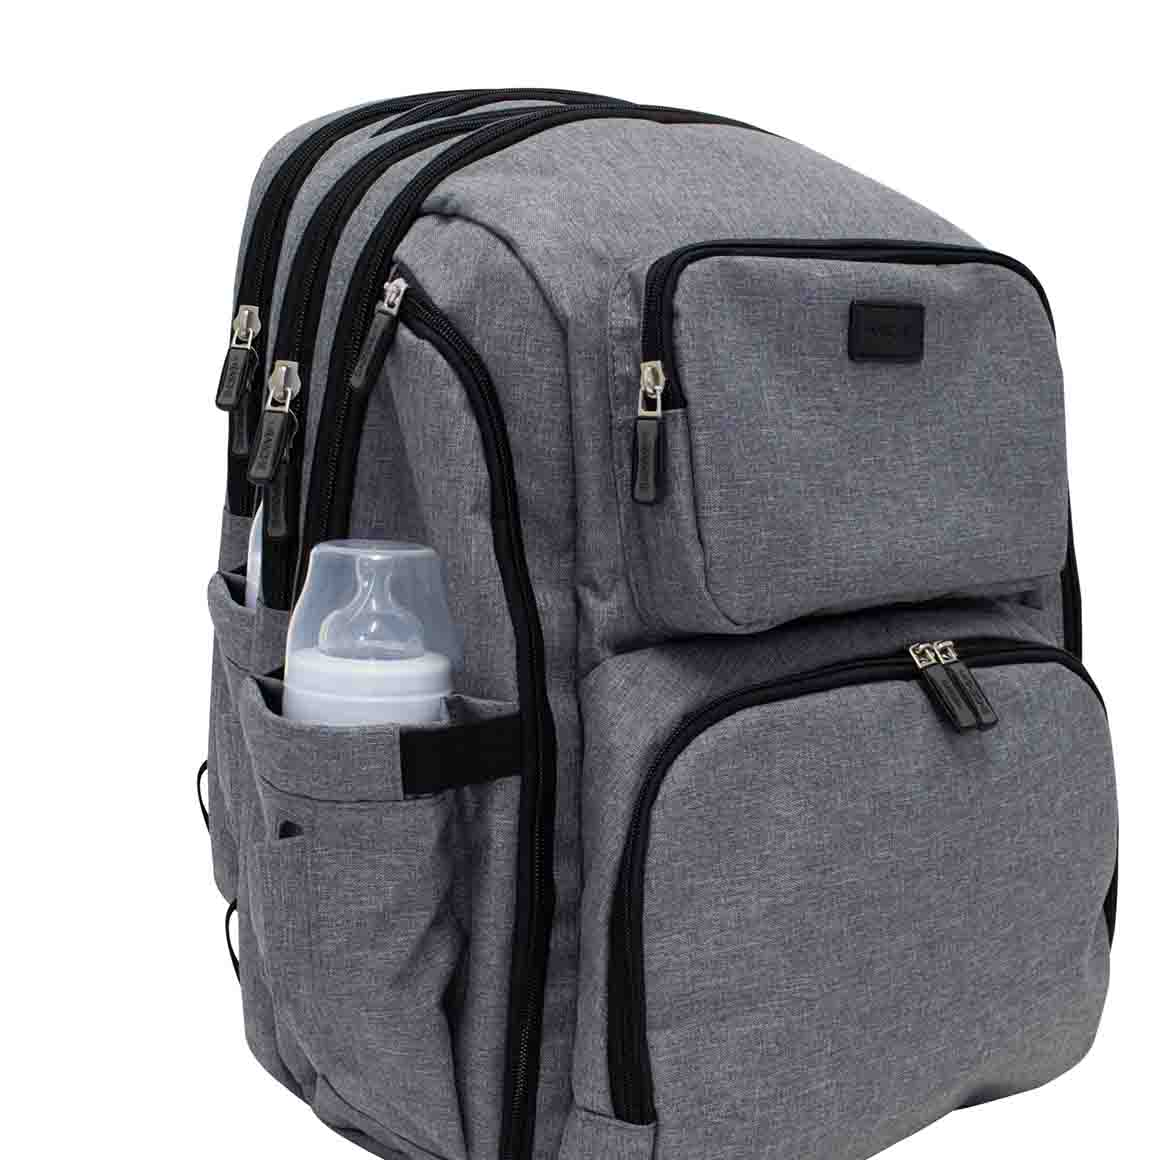 La Tasche Iconic Backpack - Grey | Trada Marketplace